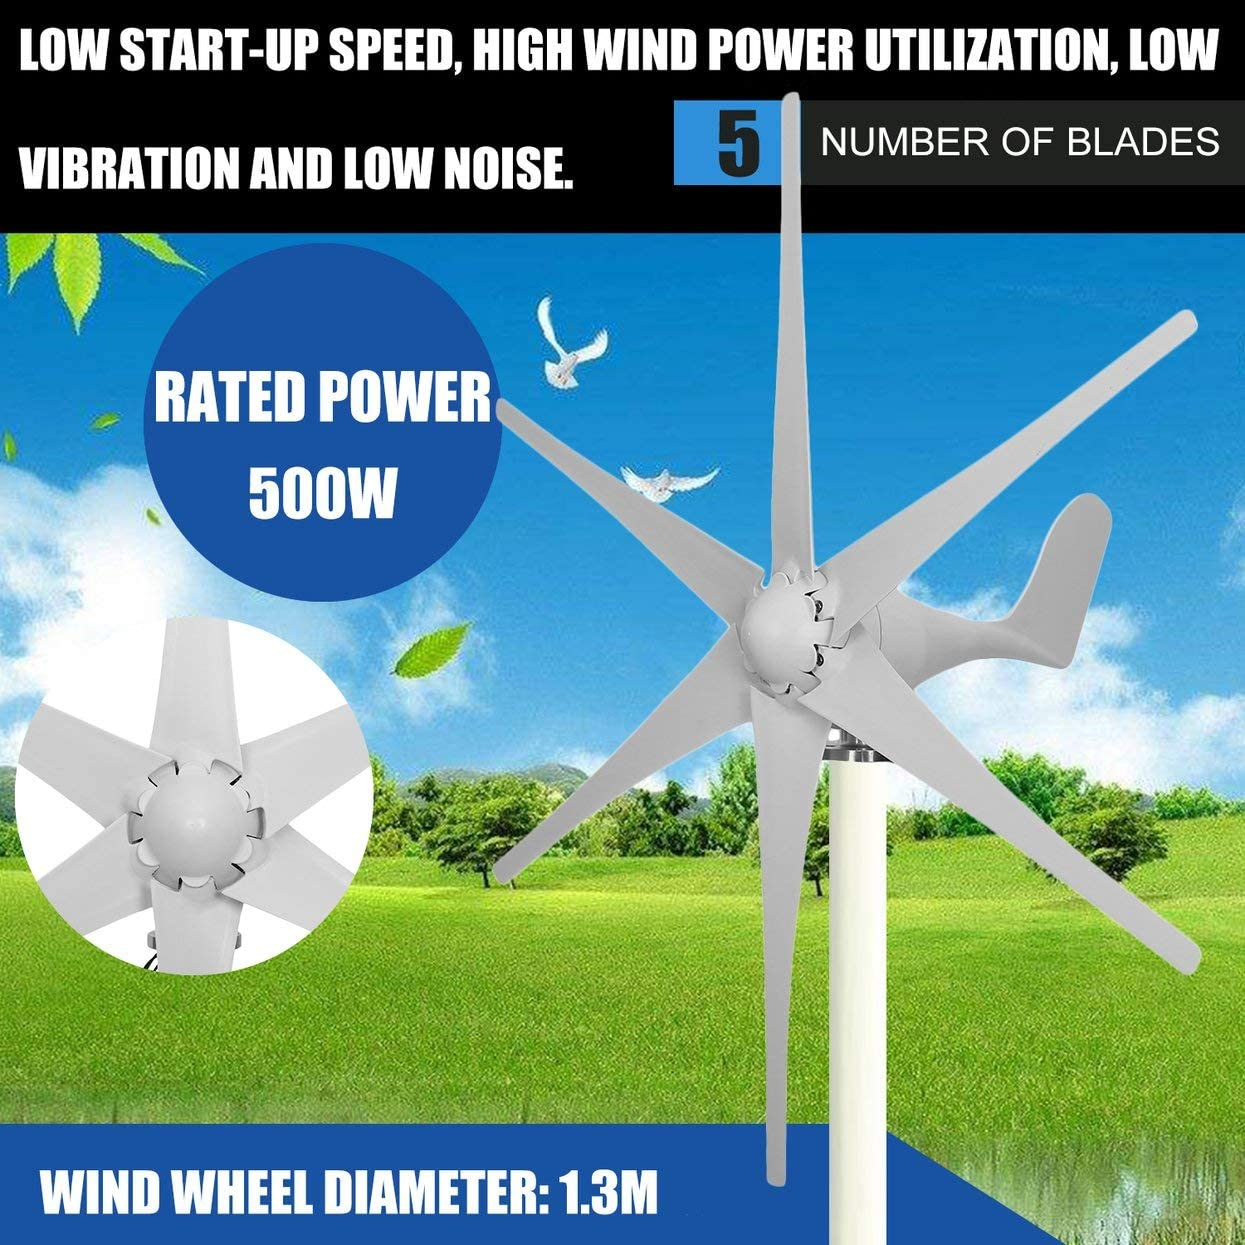 500W 48V 6 Nylon Fiber Blades Wind Power Generator Home Kit 3 Phases AC PMG BEST